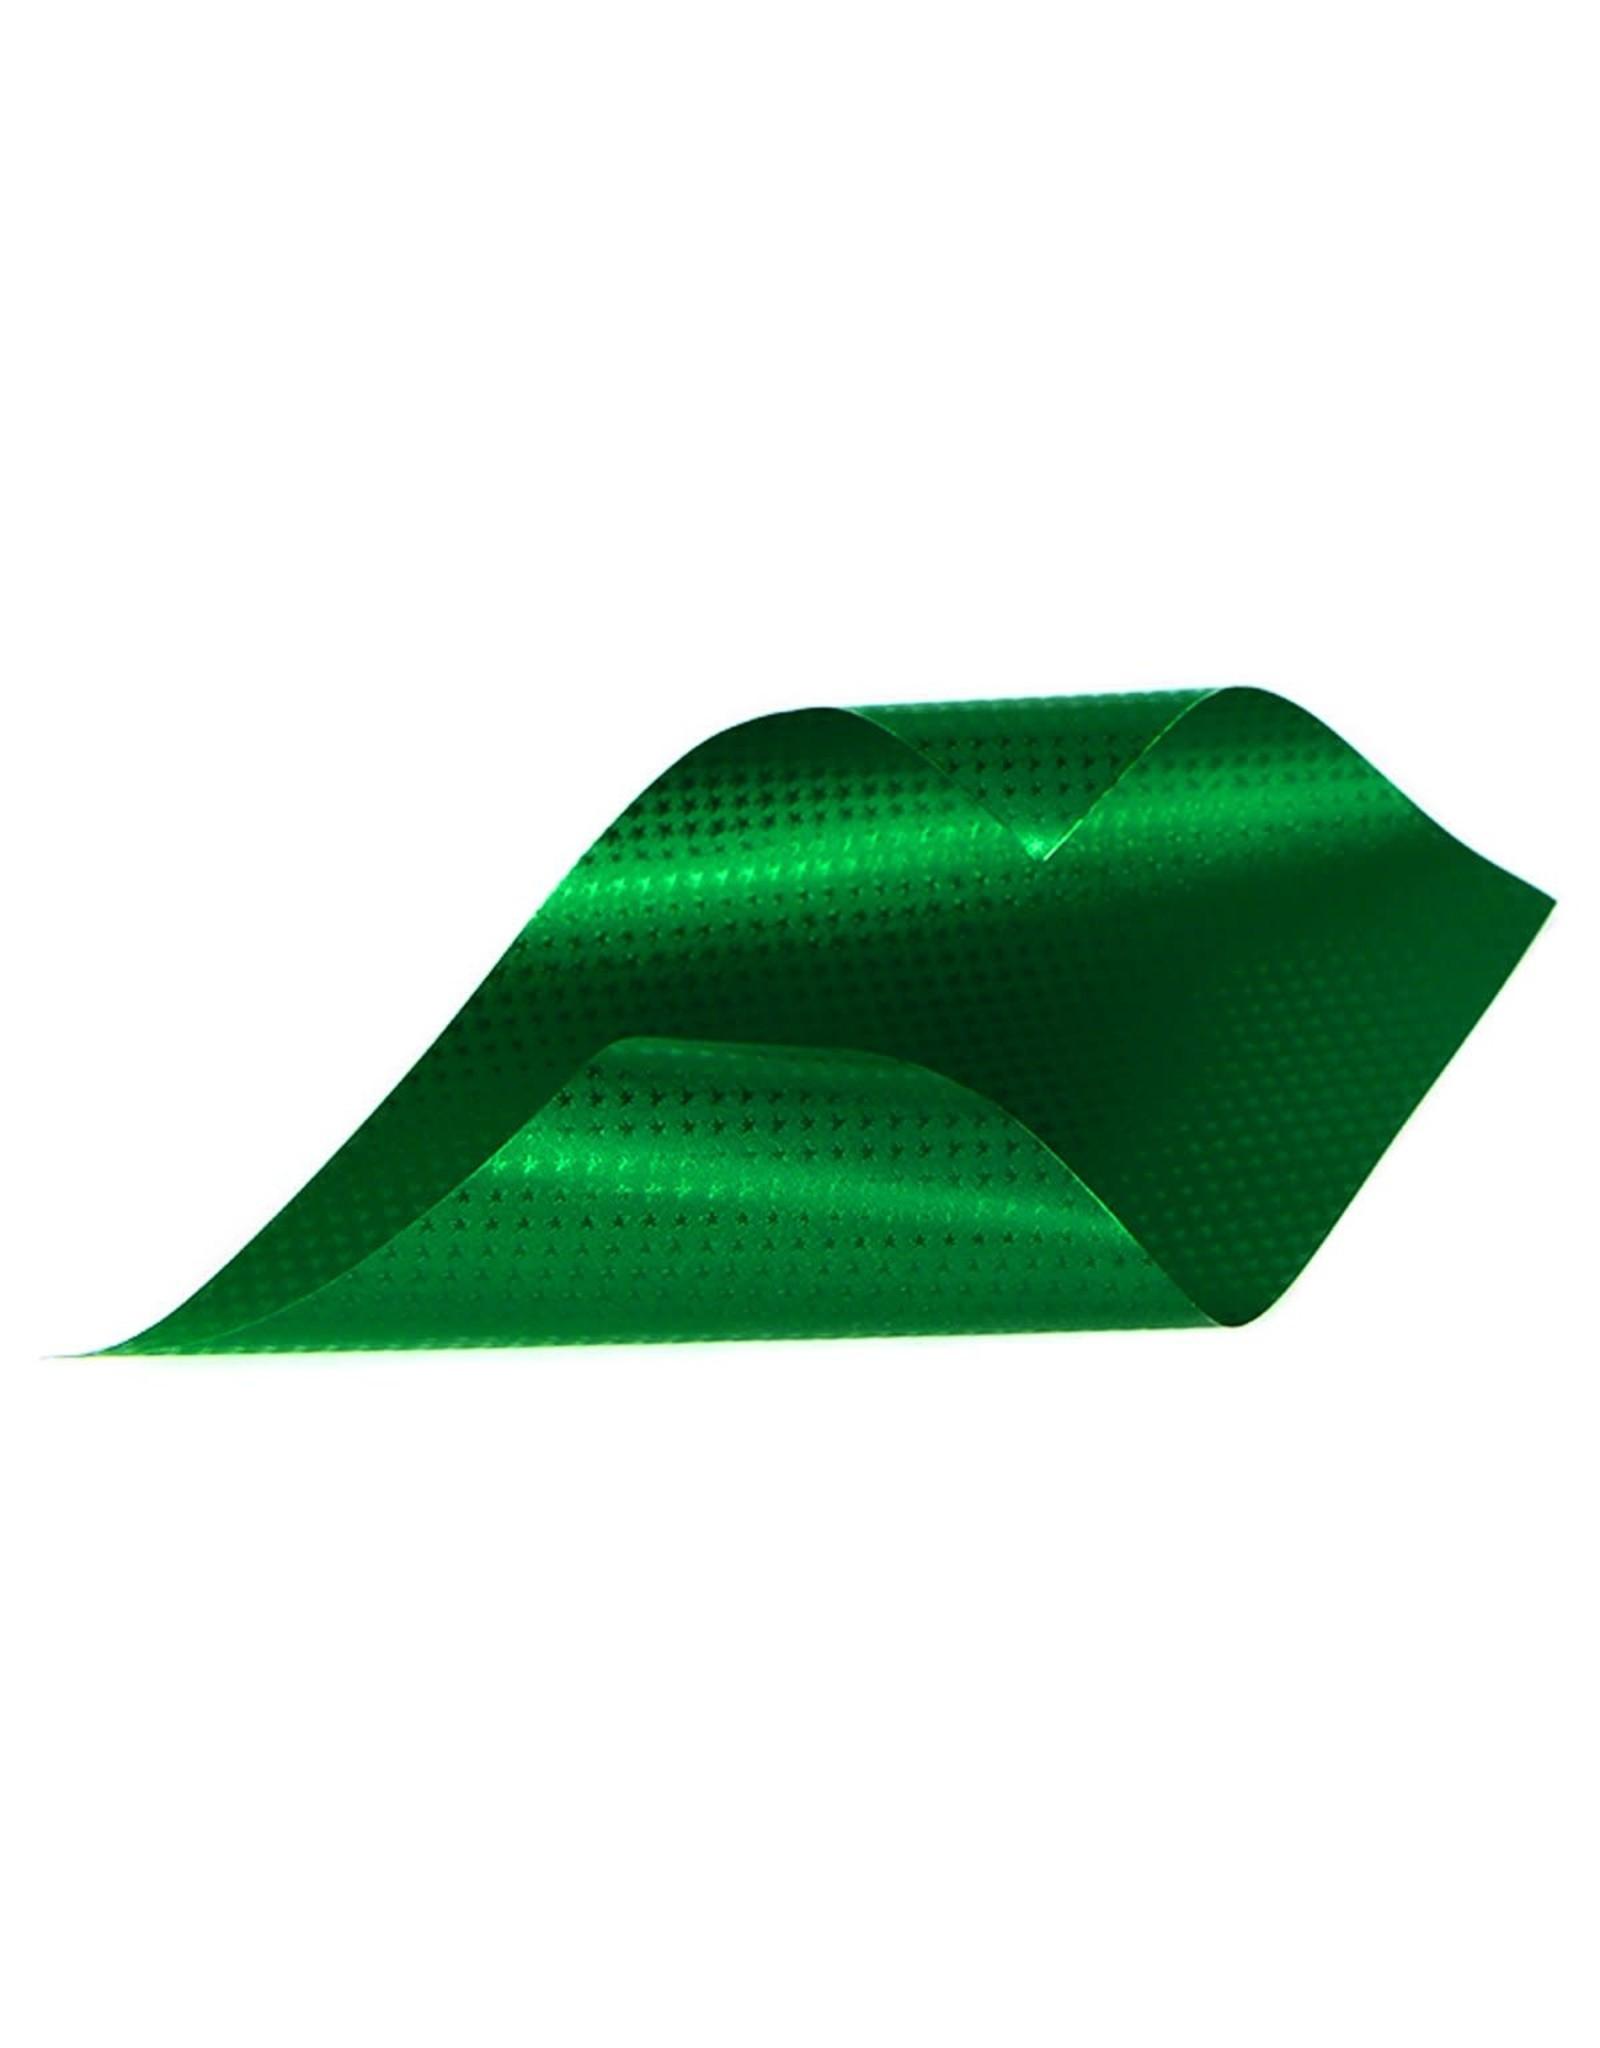 Rinea Emerald Starstruck Solid Packs and Rolls